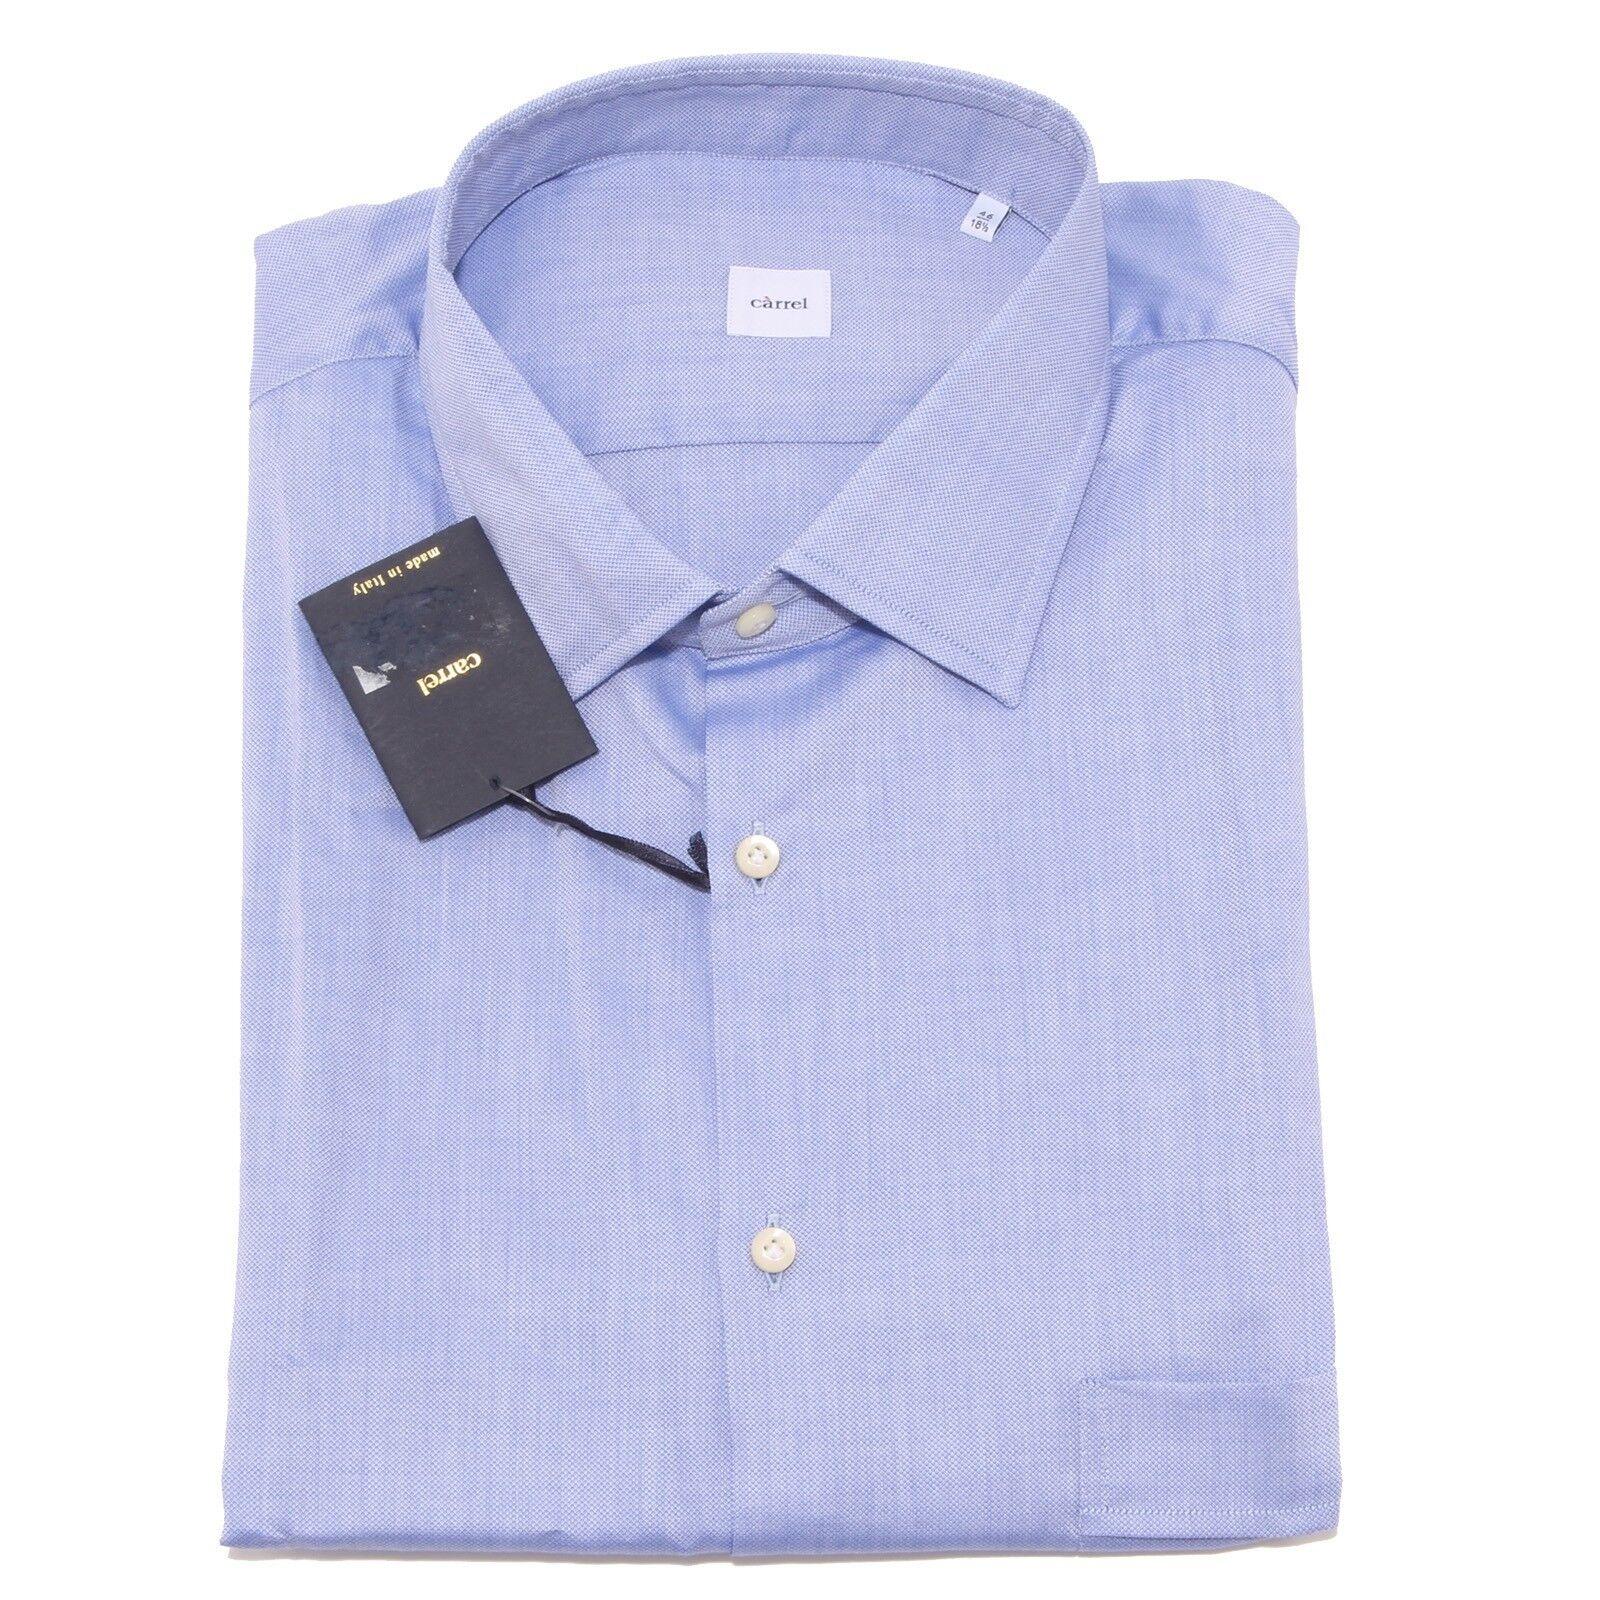 0049P camicia uomo CARREL azzurra manica corta shirt Uomo sleeveless